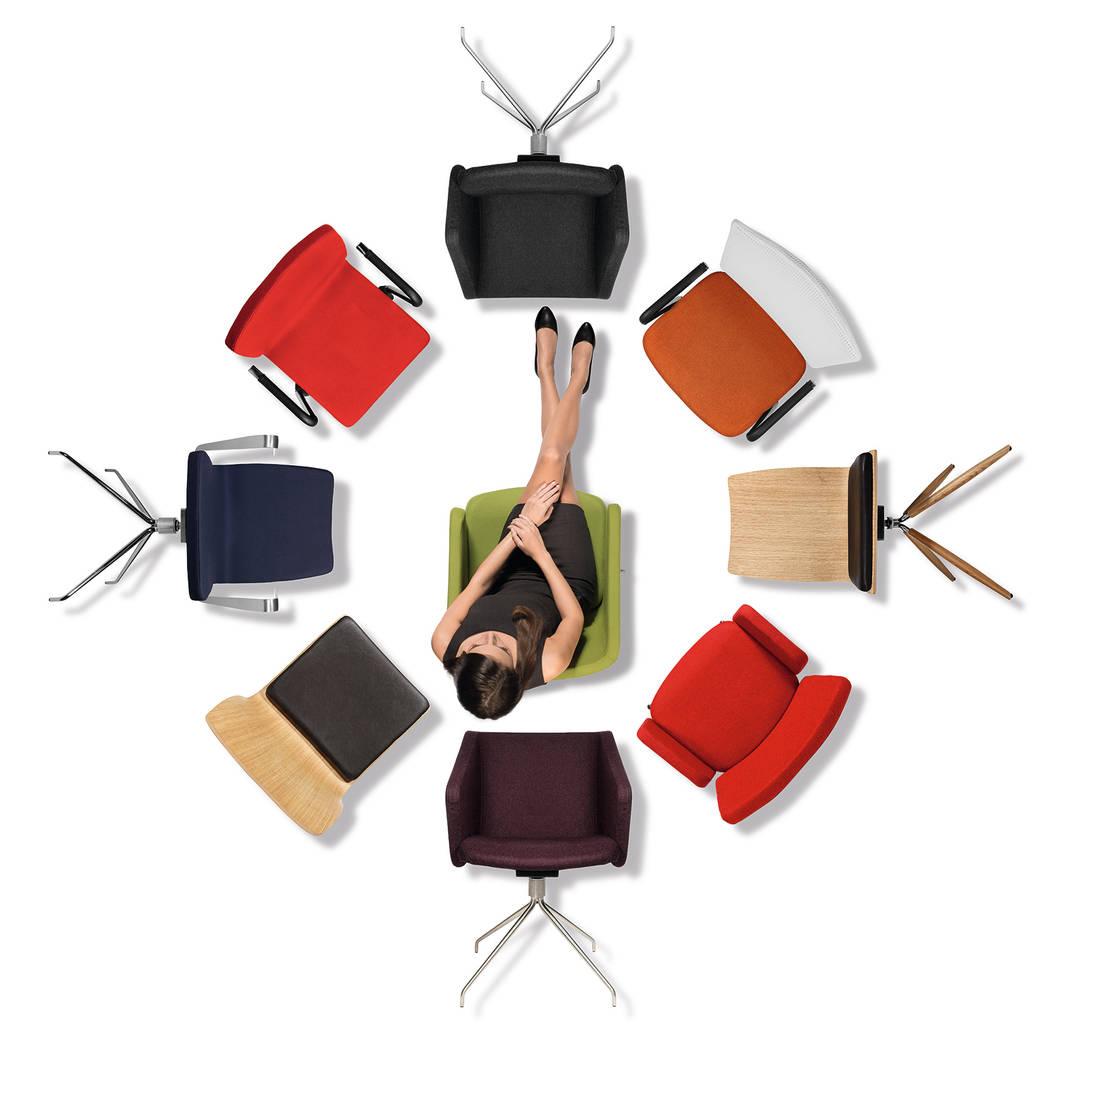 sitness for home esstisch stuhl serie f r topstar von andy dittrich produktdesign homify. Black Bedroom Furniture Sets. Home Design Ideas